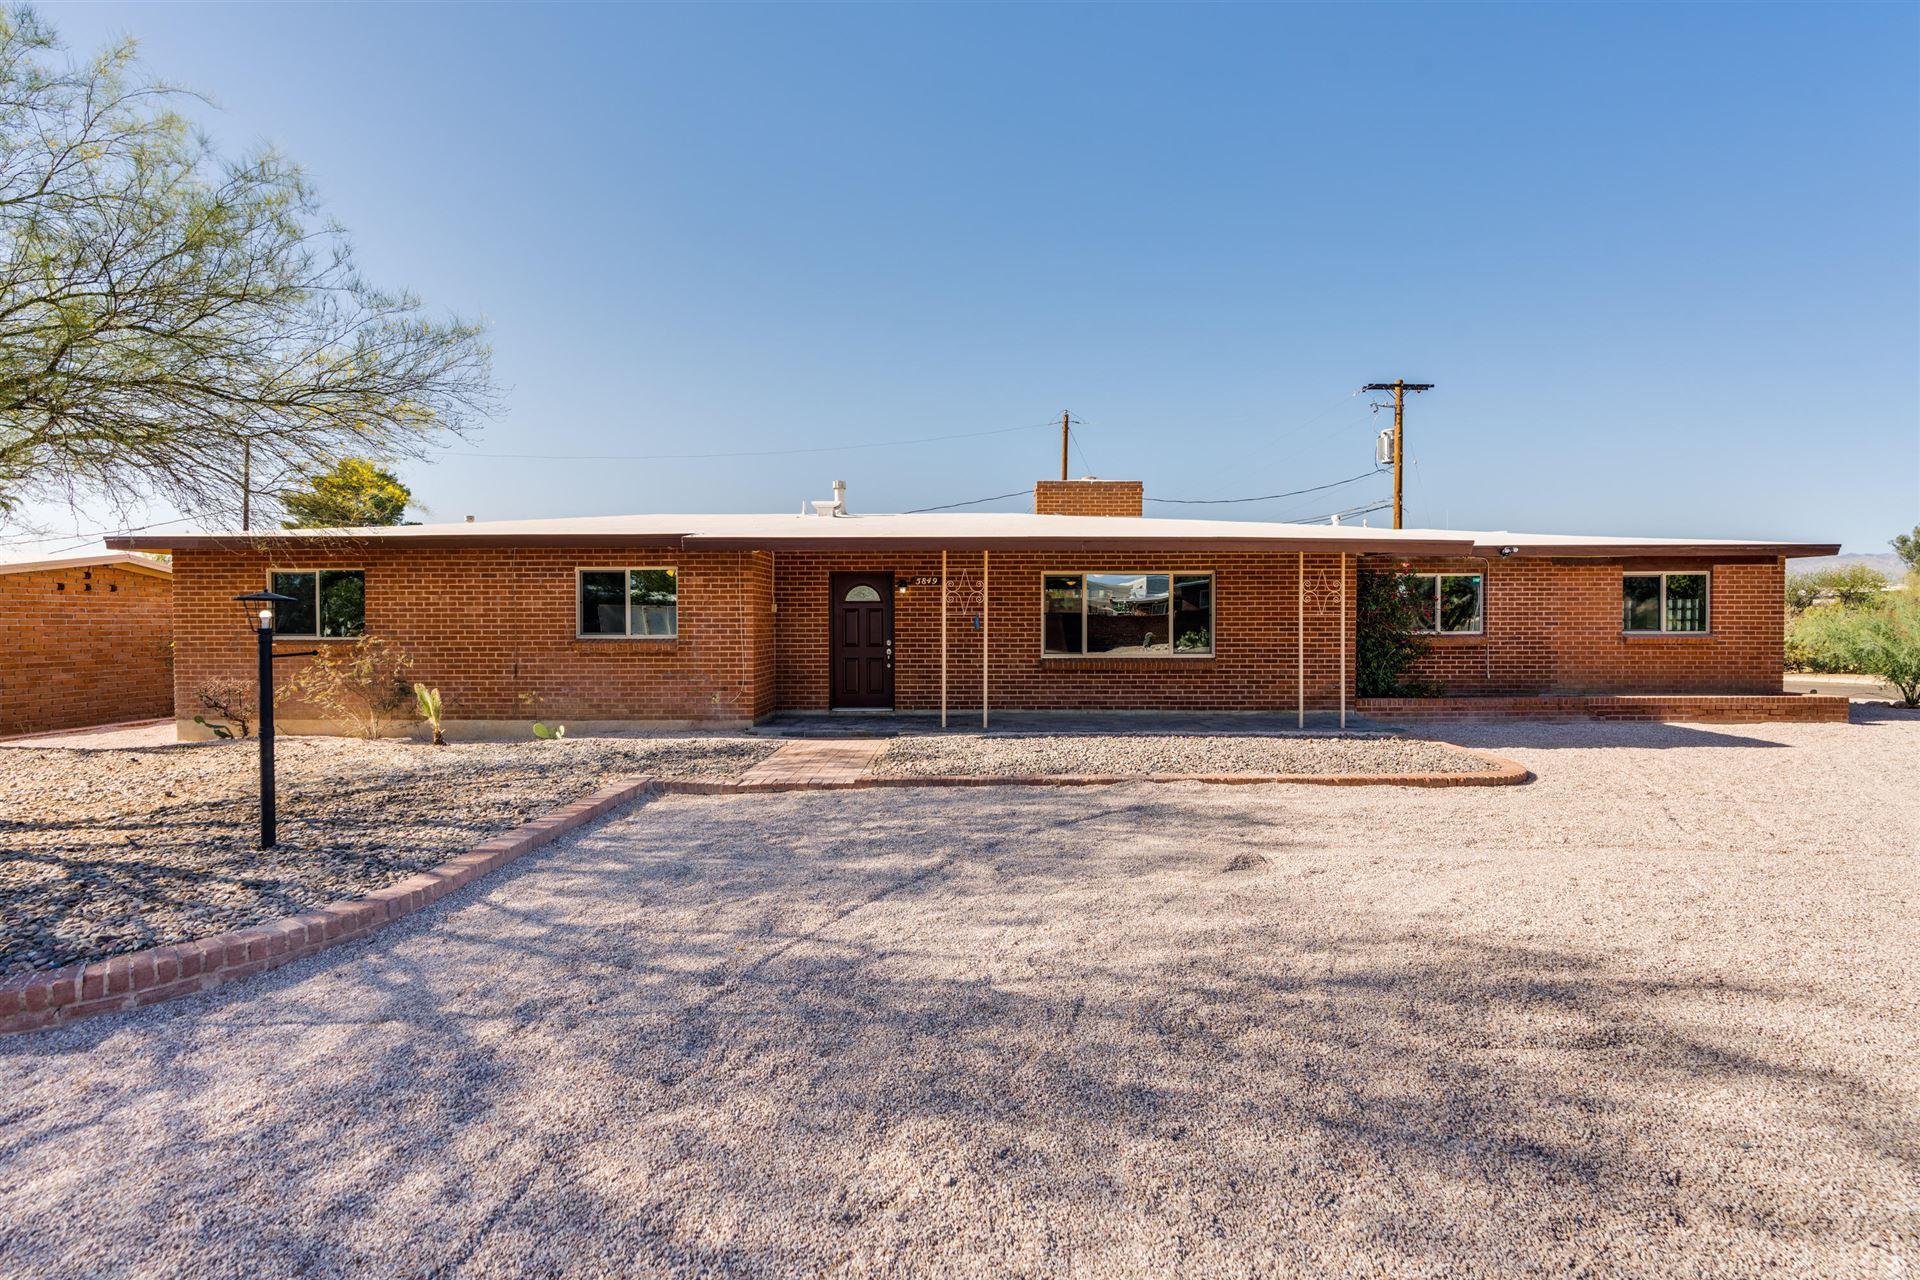 5849 E Burns Street, Tucson, AZ 85711 - MLS#: 22112482